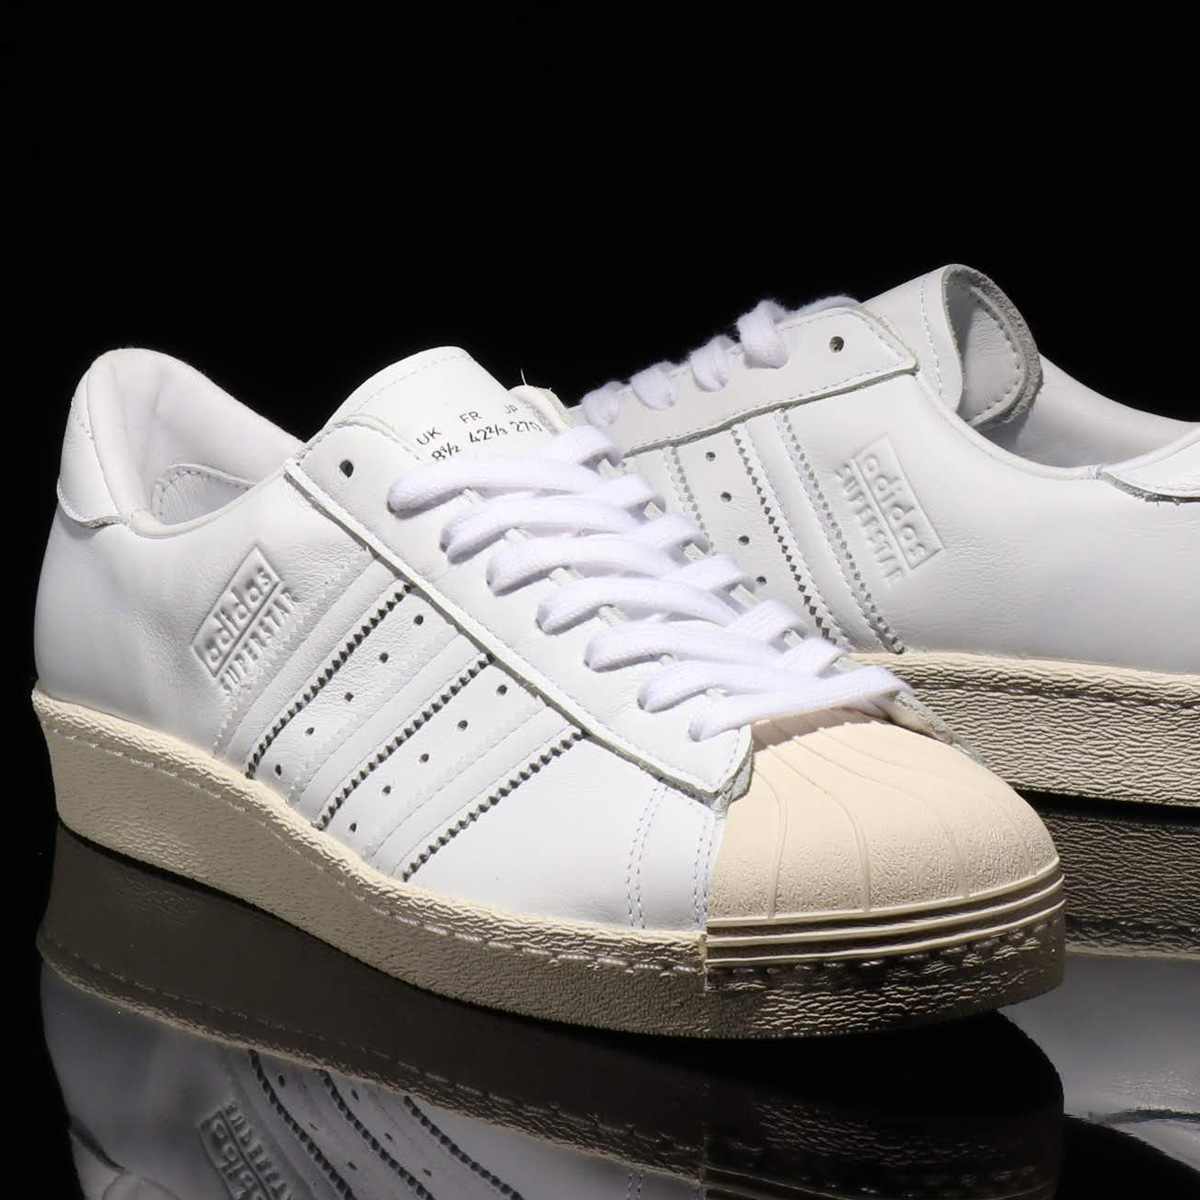 adidas Originals SUPERSTAR 80s RECON(アディダスオリジナルス スーパースター 80s リーコン)RUNNING WHITE/RUNNING WHITE/OFF WHITE【メンズ レディース スニーカー】19SS-I